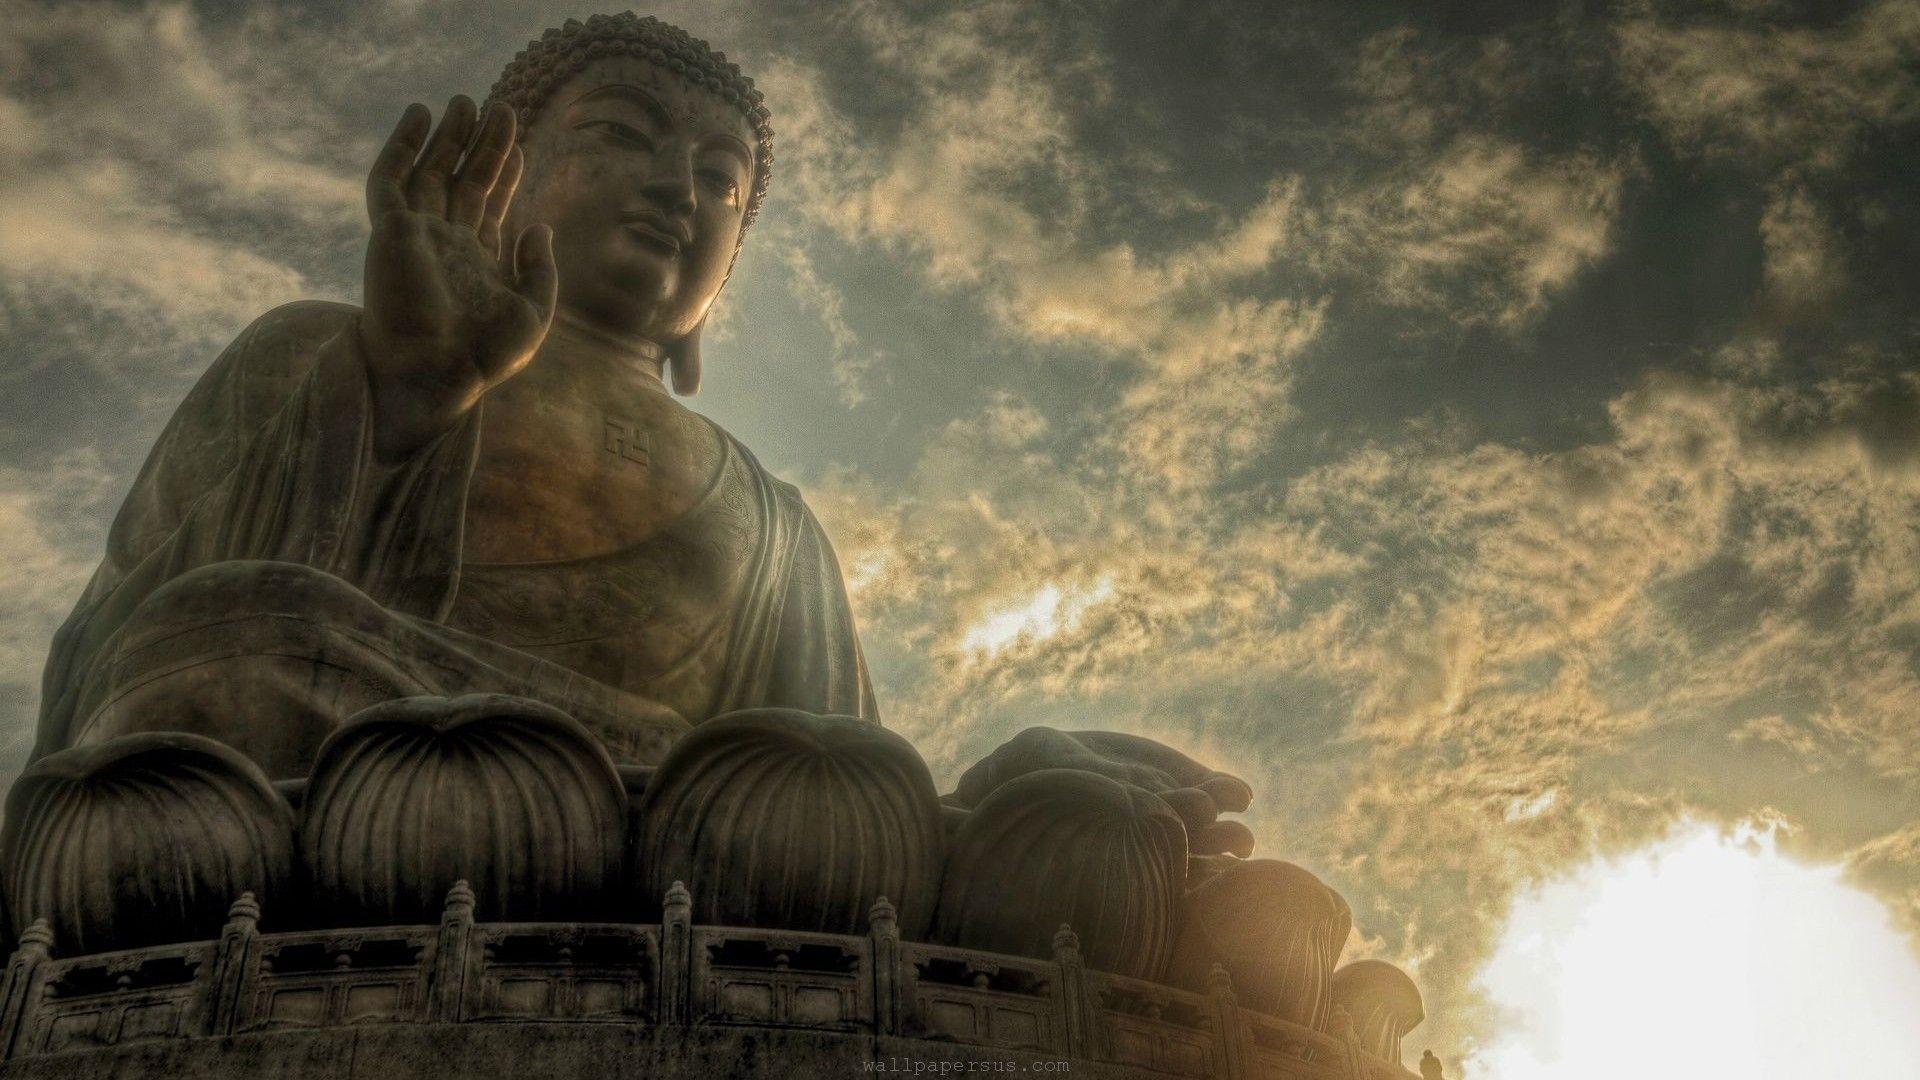 1920x1080 Lord Buddha HD Wallpapers Free Wallpaper Downloads 800 600